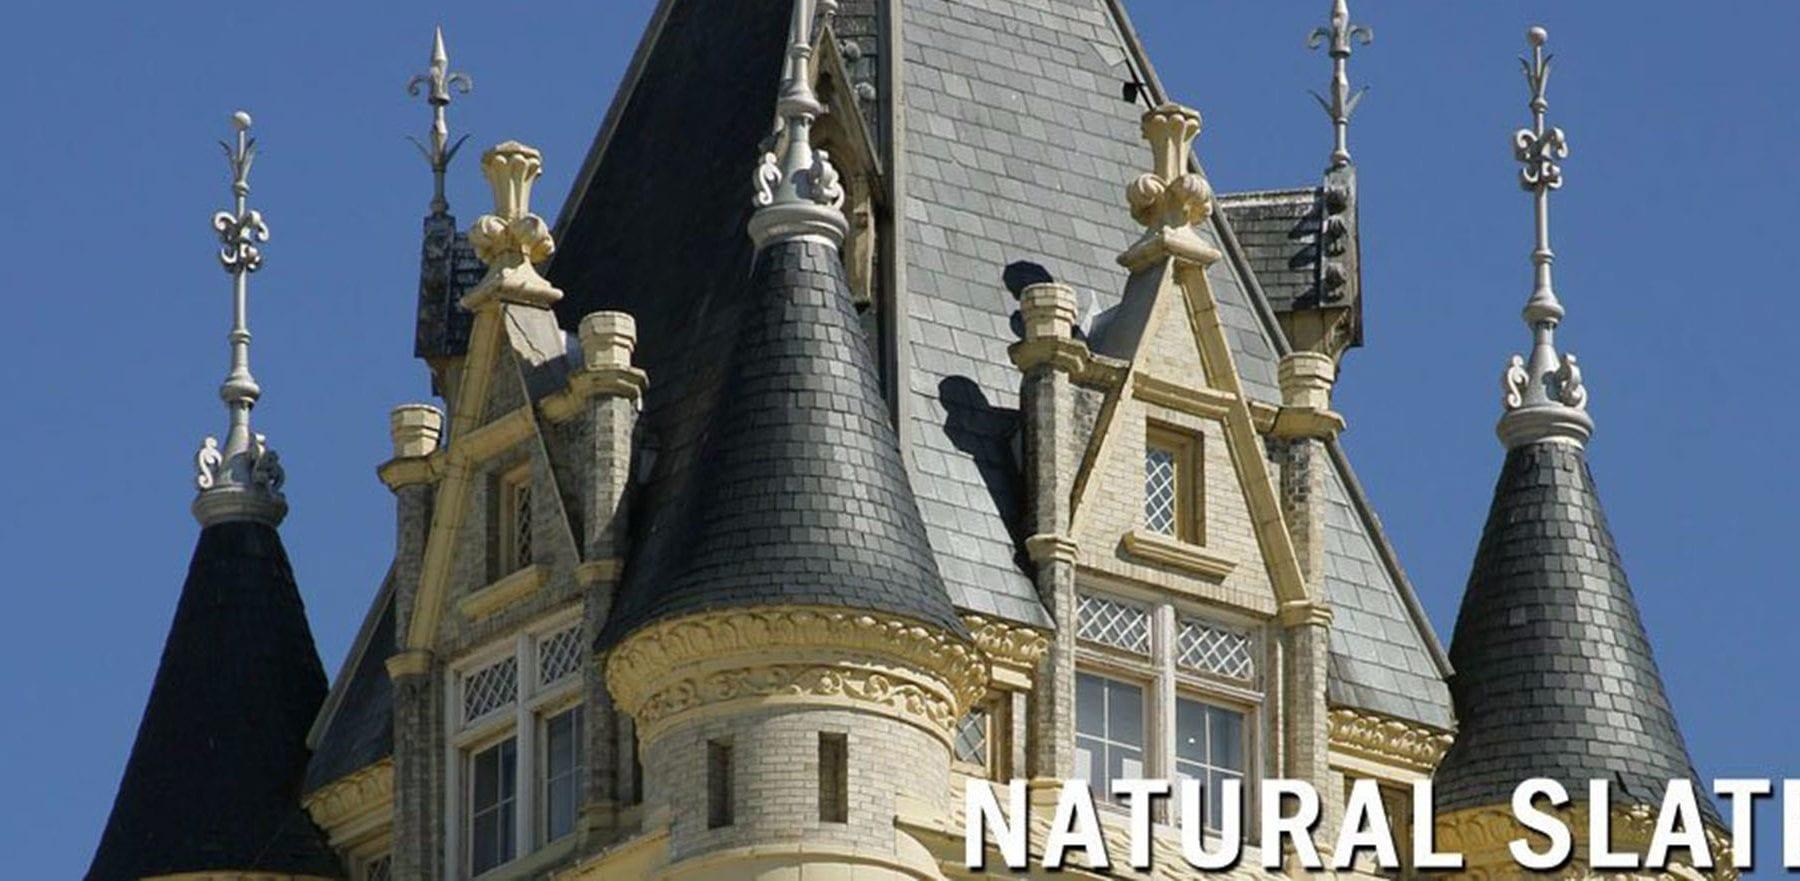 Lifestiles - Canadian Natural Slate Roof Tiles - Various, England 4